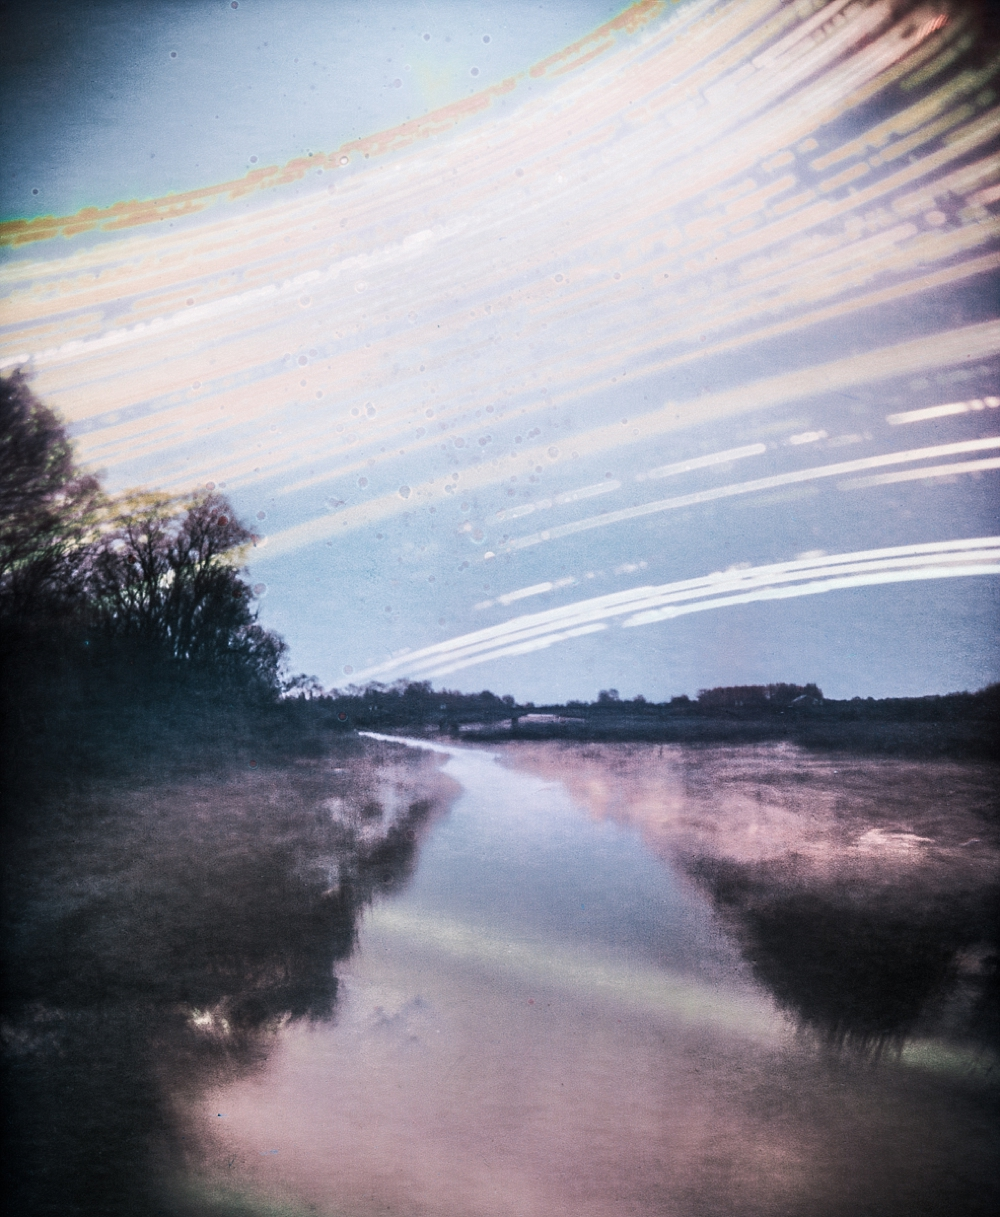 Metsik jõgi/River Wild